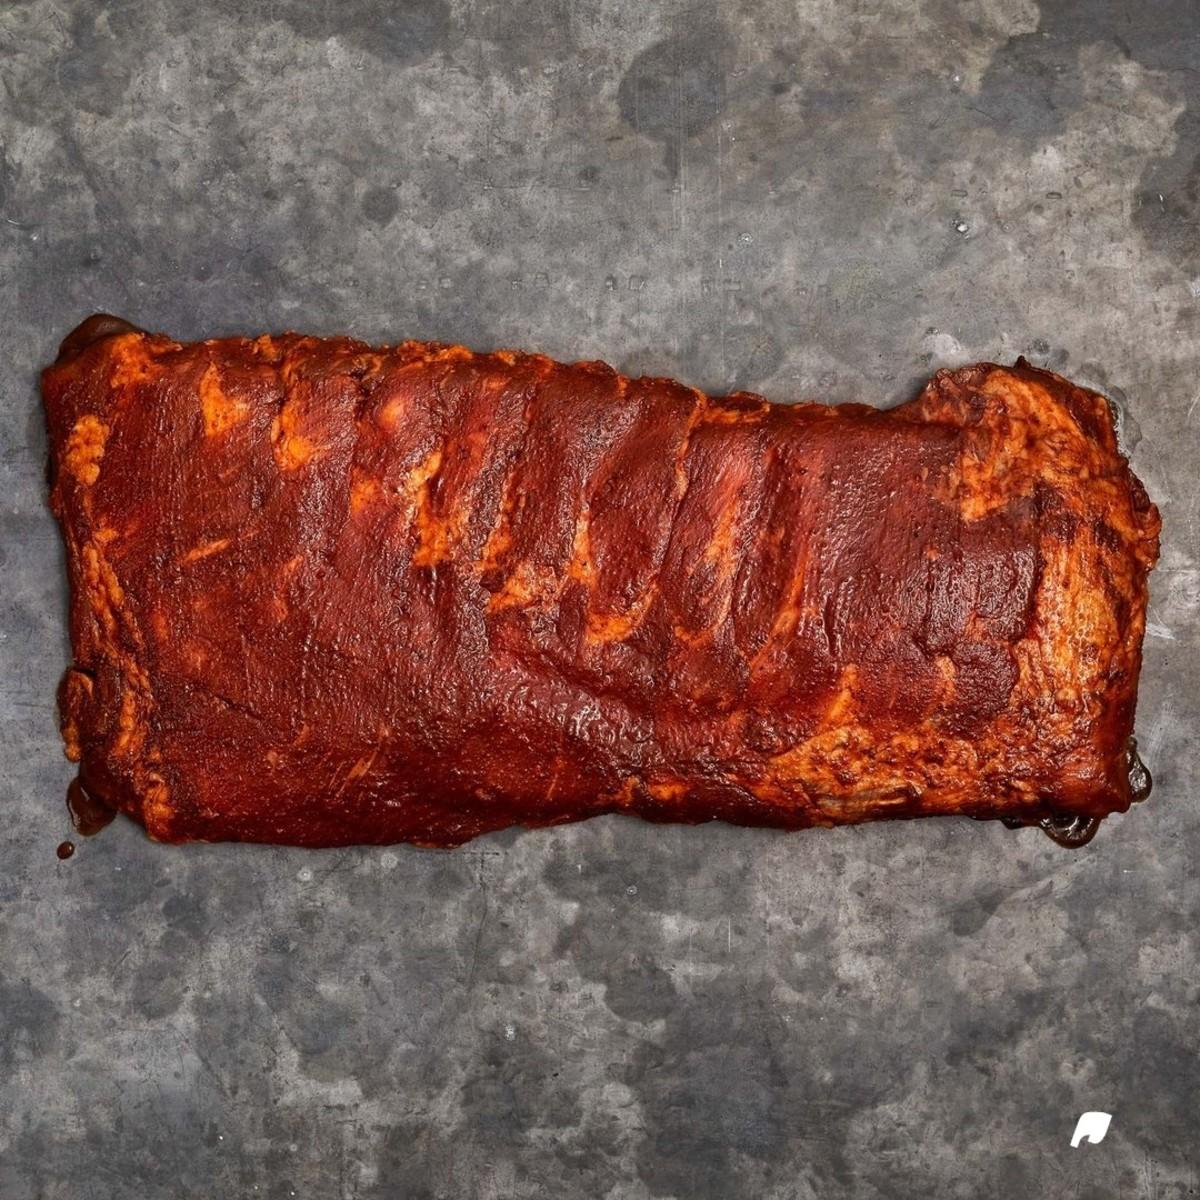 smoking-up-some-spare-ribs